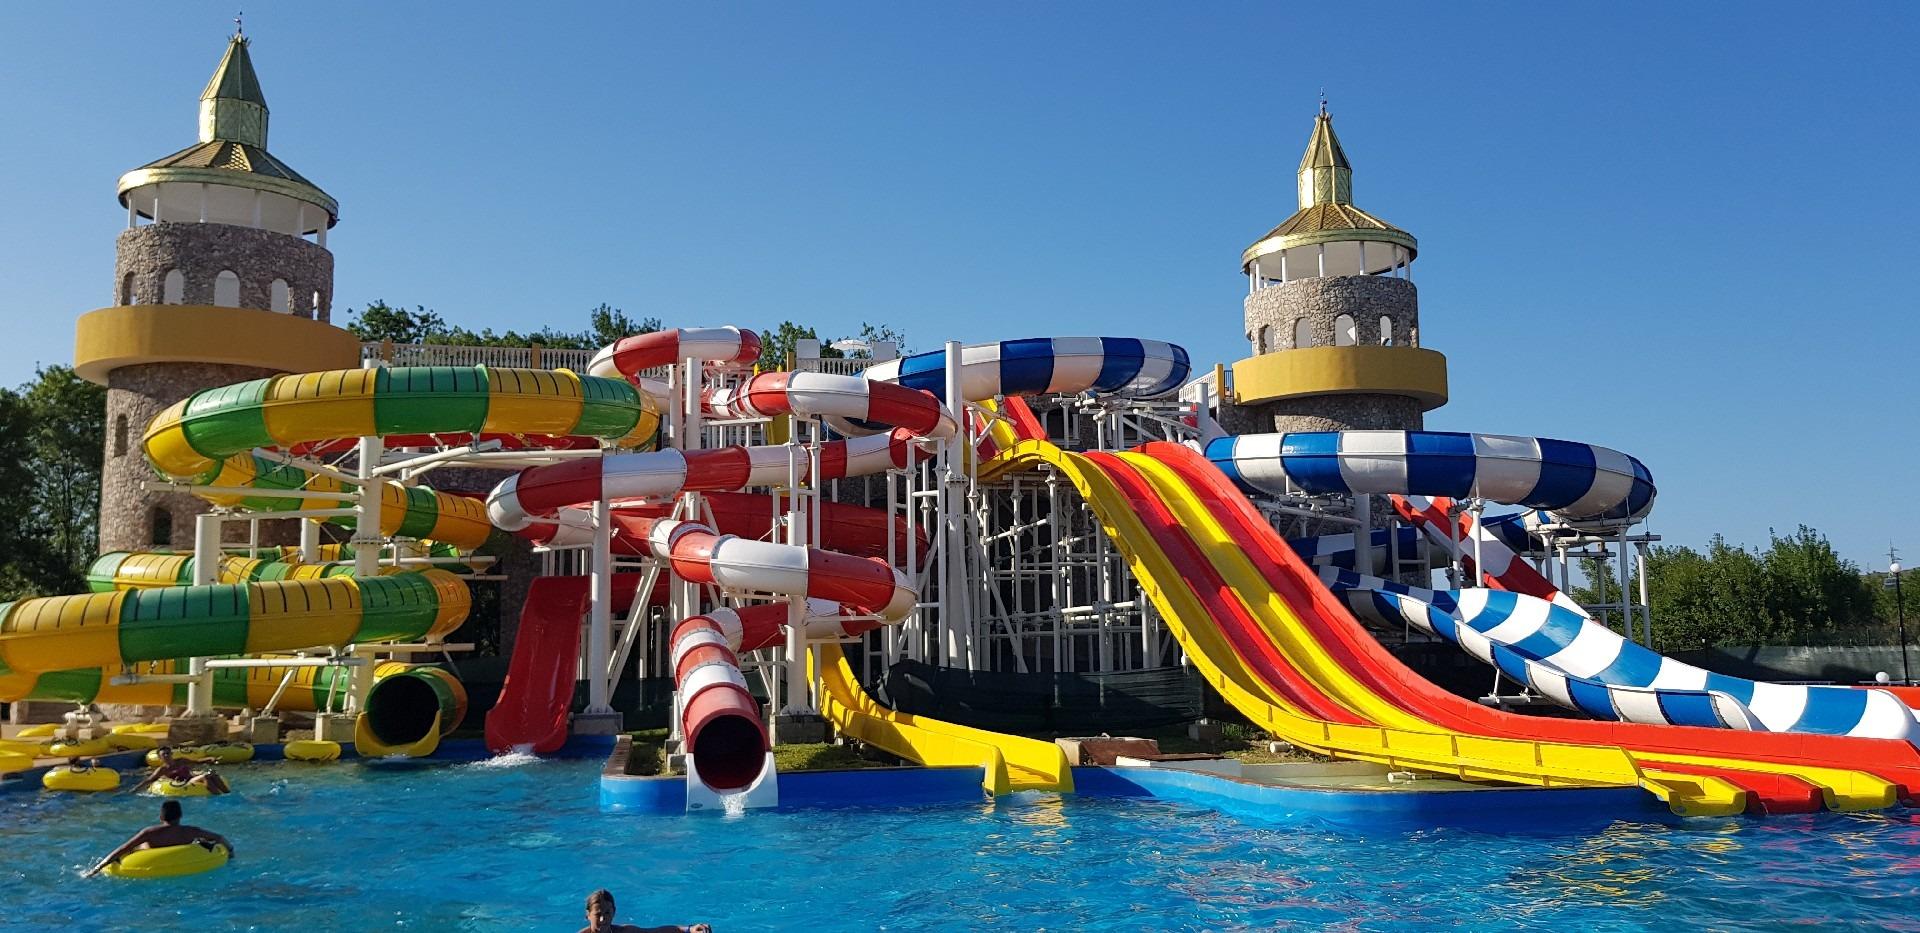 summer language Z camp seaside, Day 36 - Neptune aqua park, combined water slide